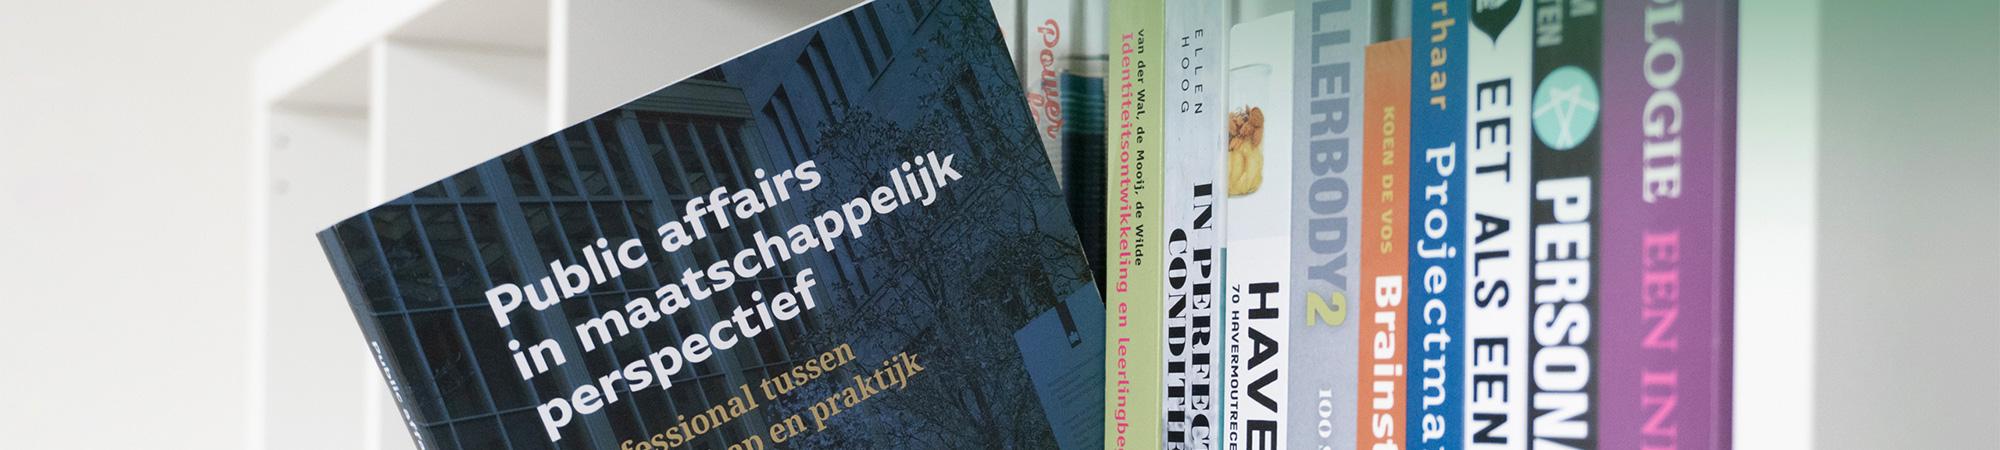 boek over public affairs en lobbyen